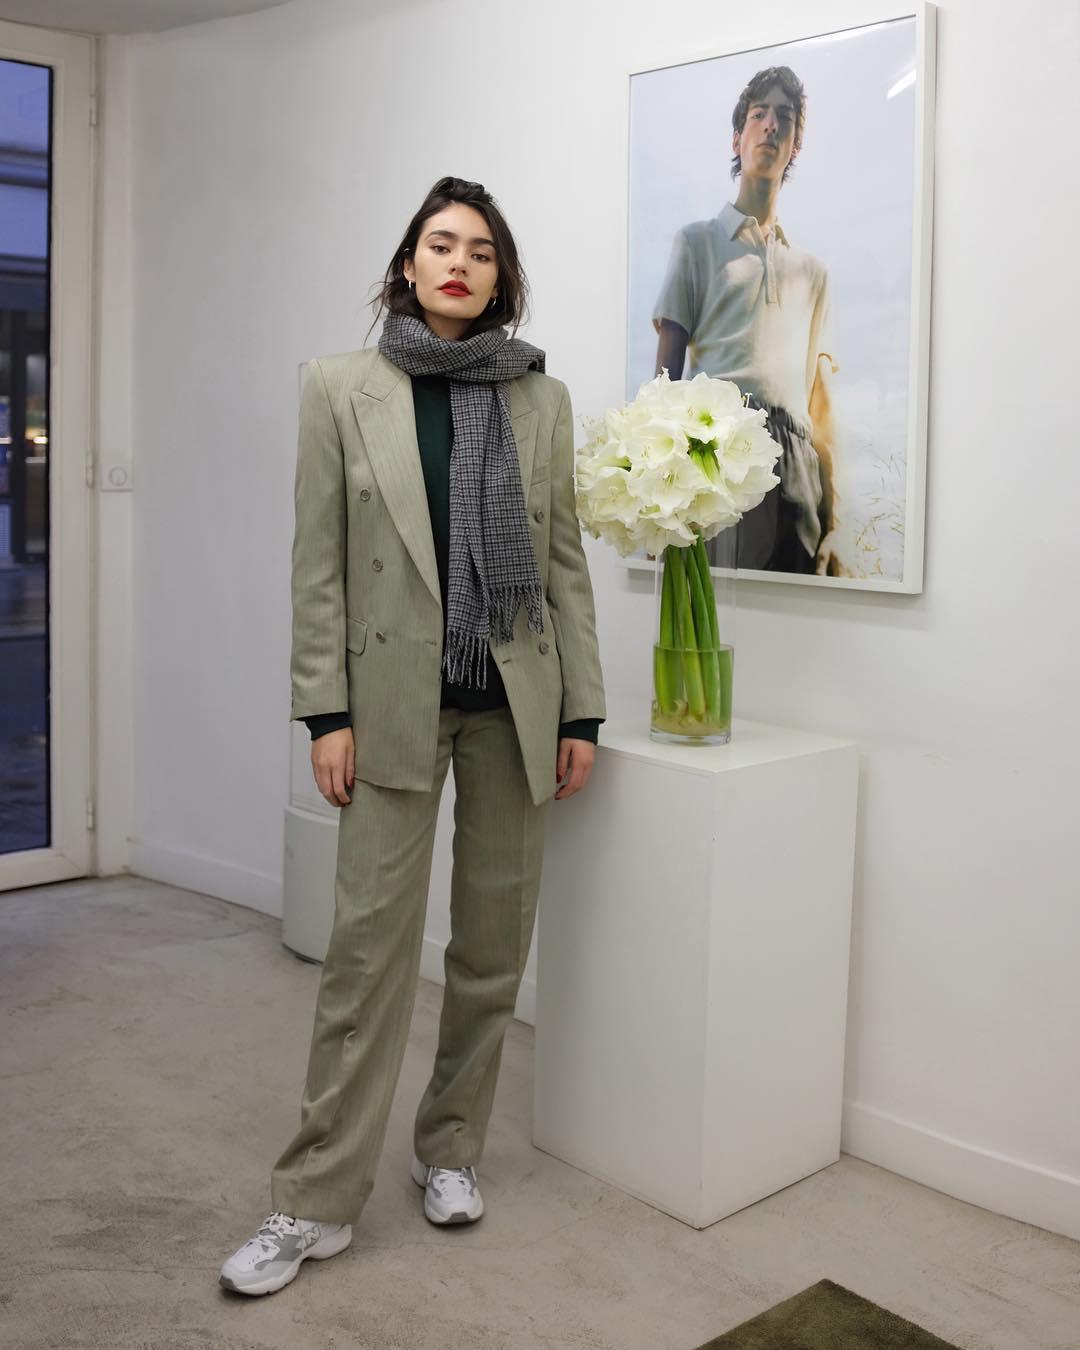 Kaitlyn-Fitzpatrick-Wallpapers-Insta-Fit-Bio-7